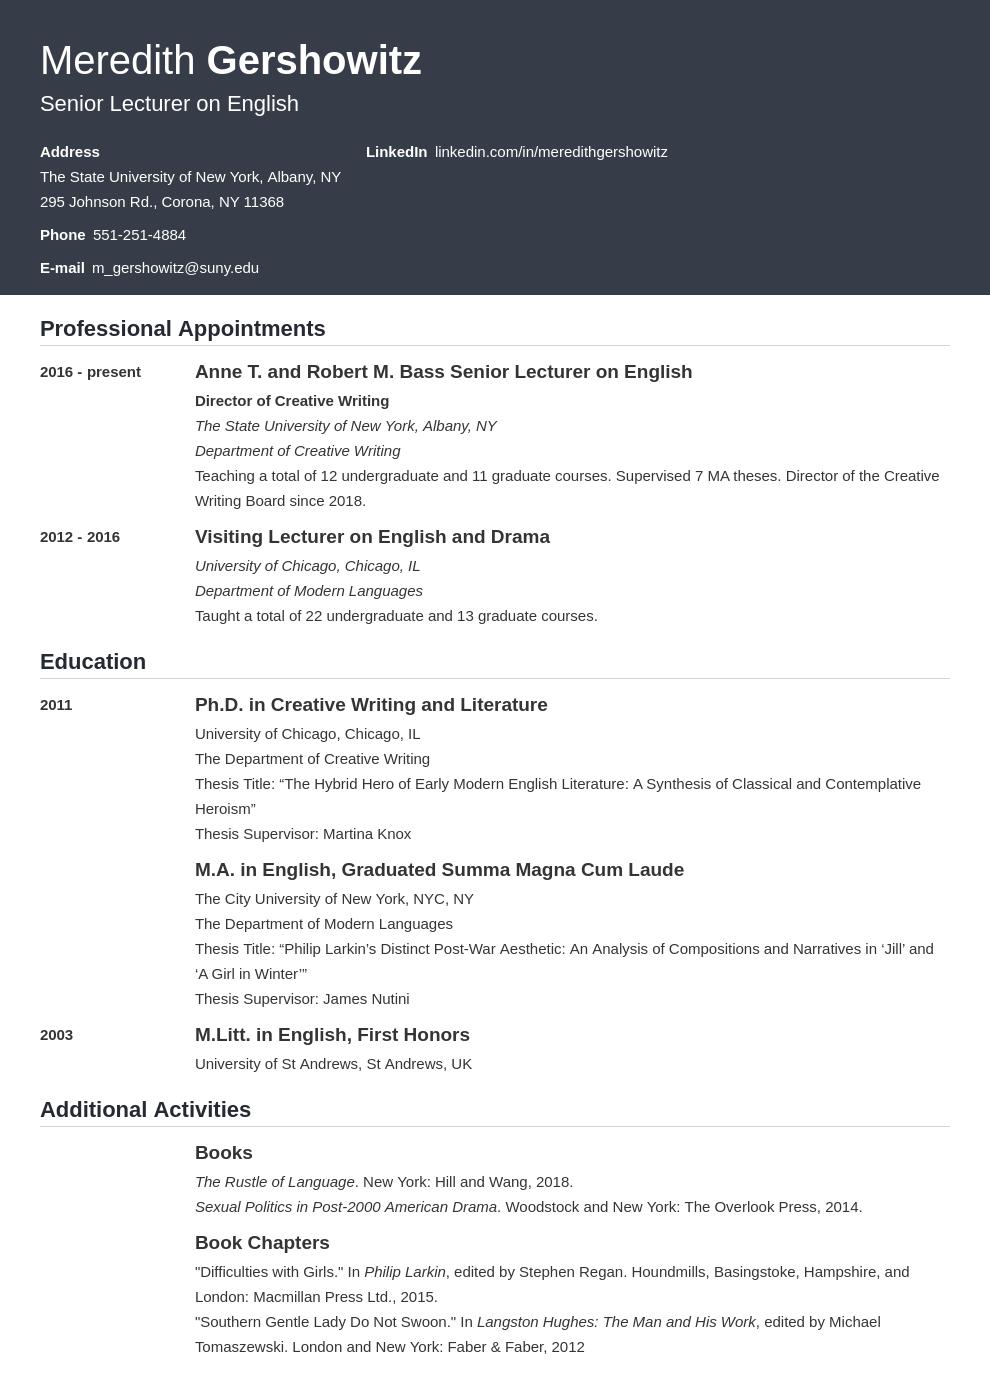 cv academic template influx